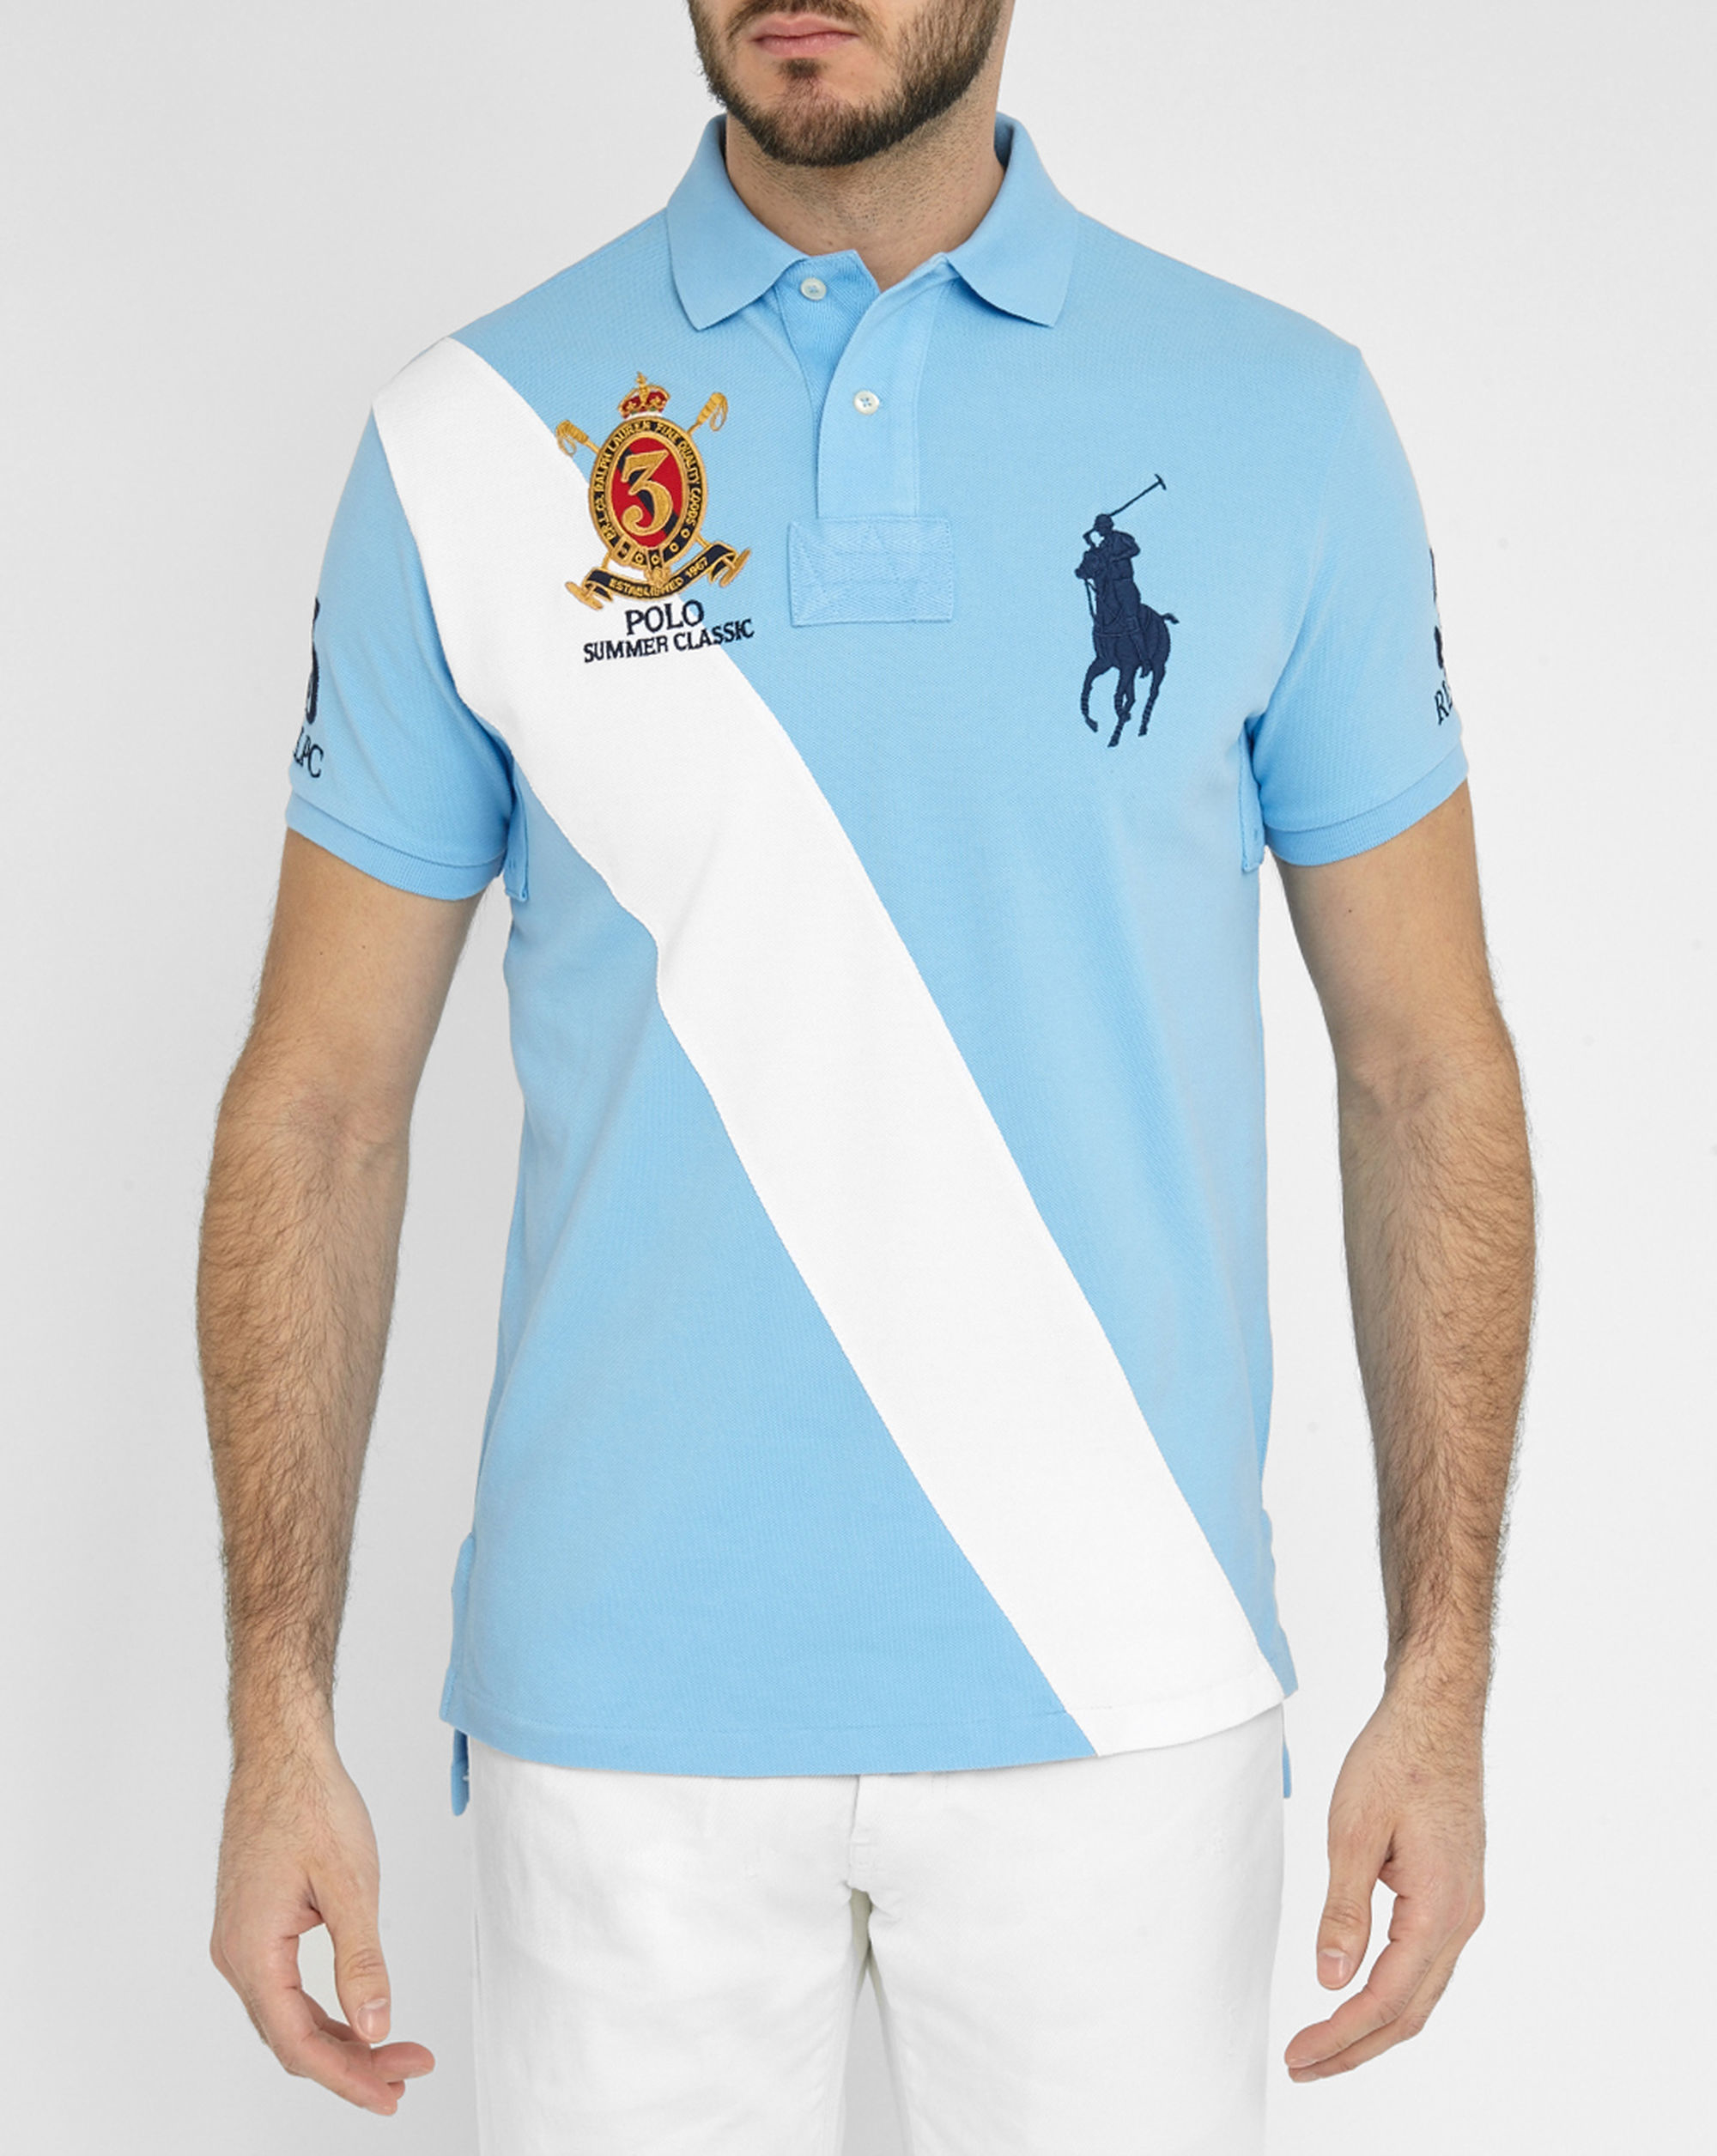 lauren polo shirts ralphlaure